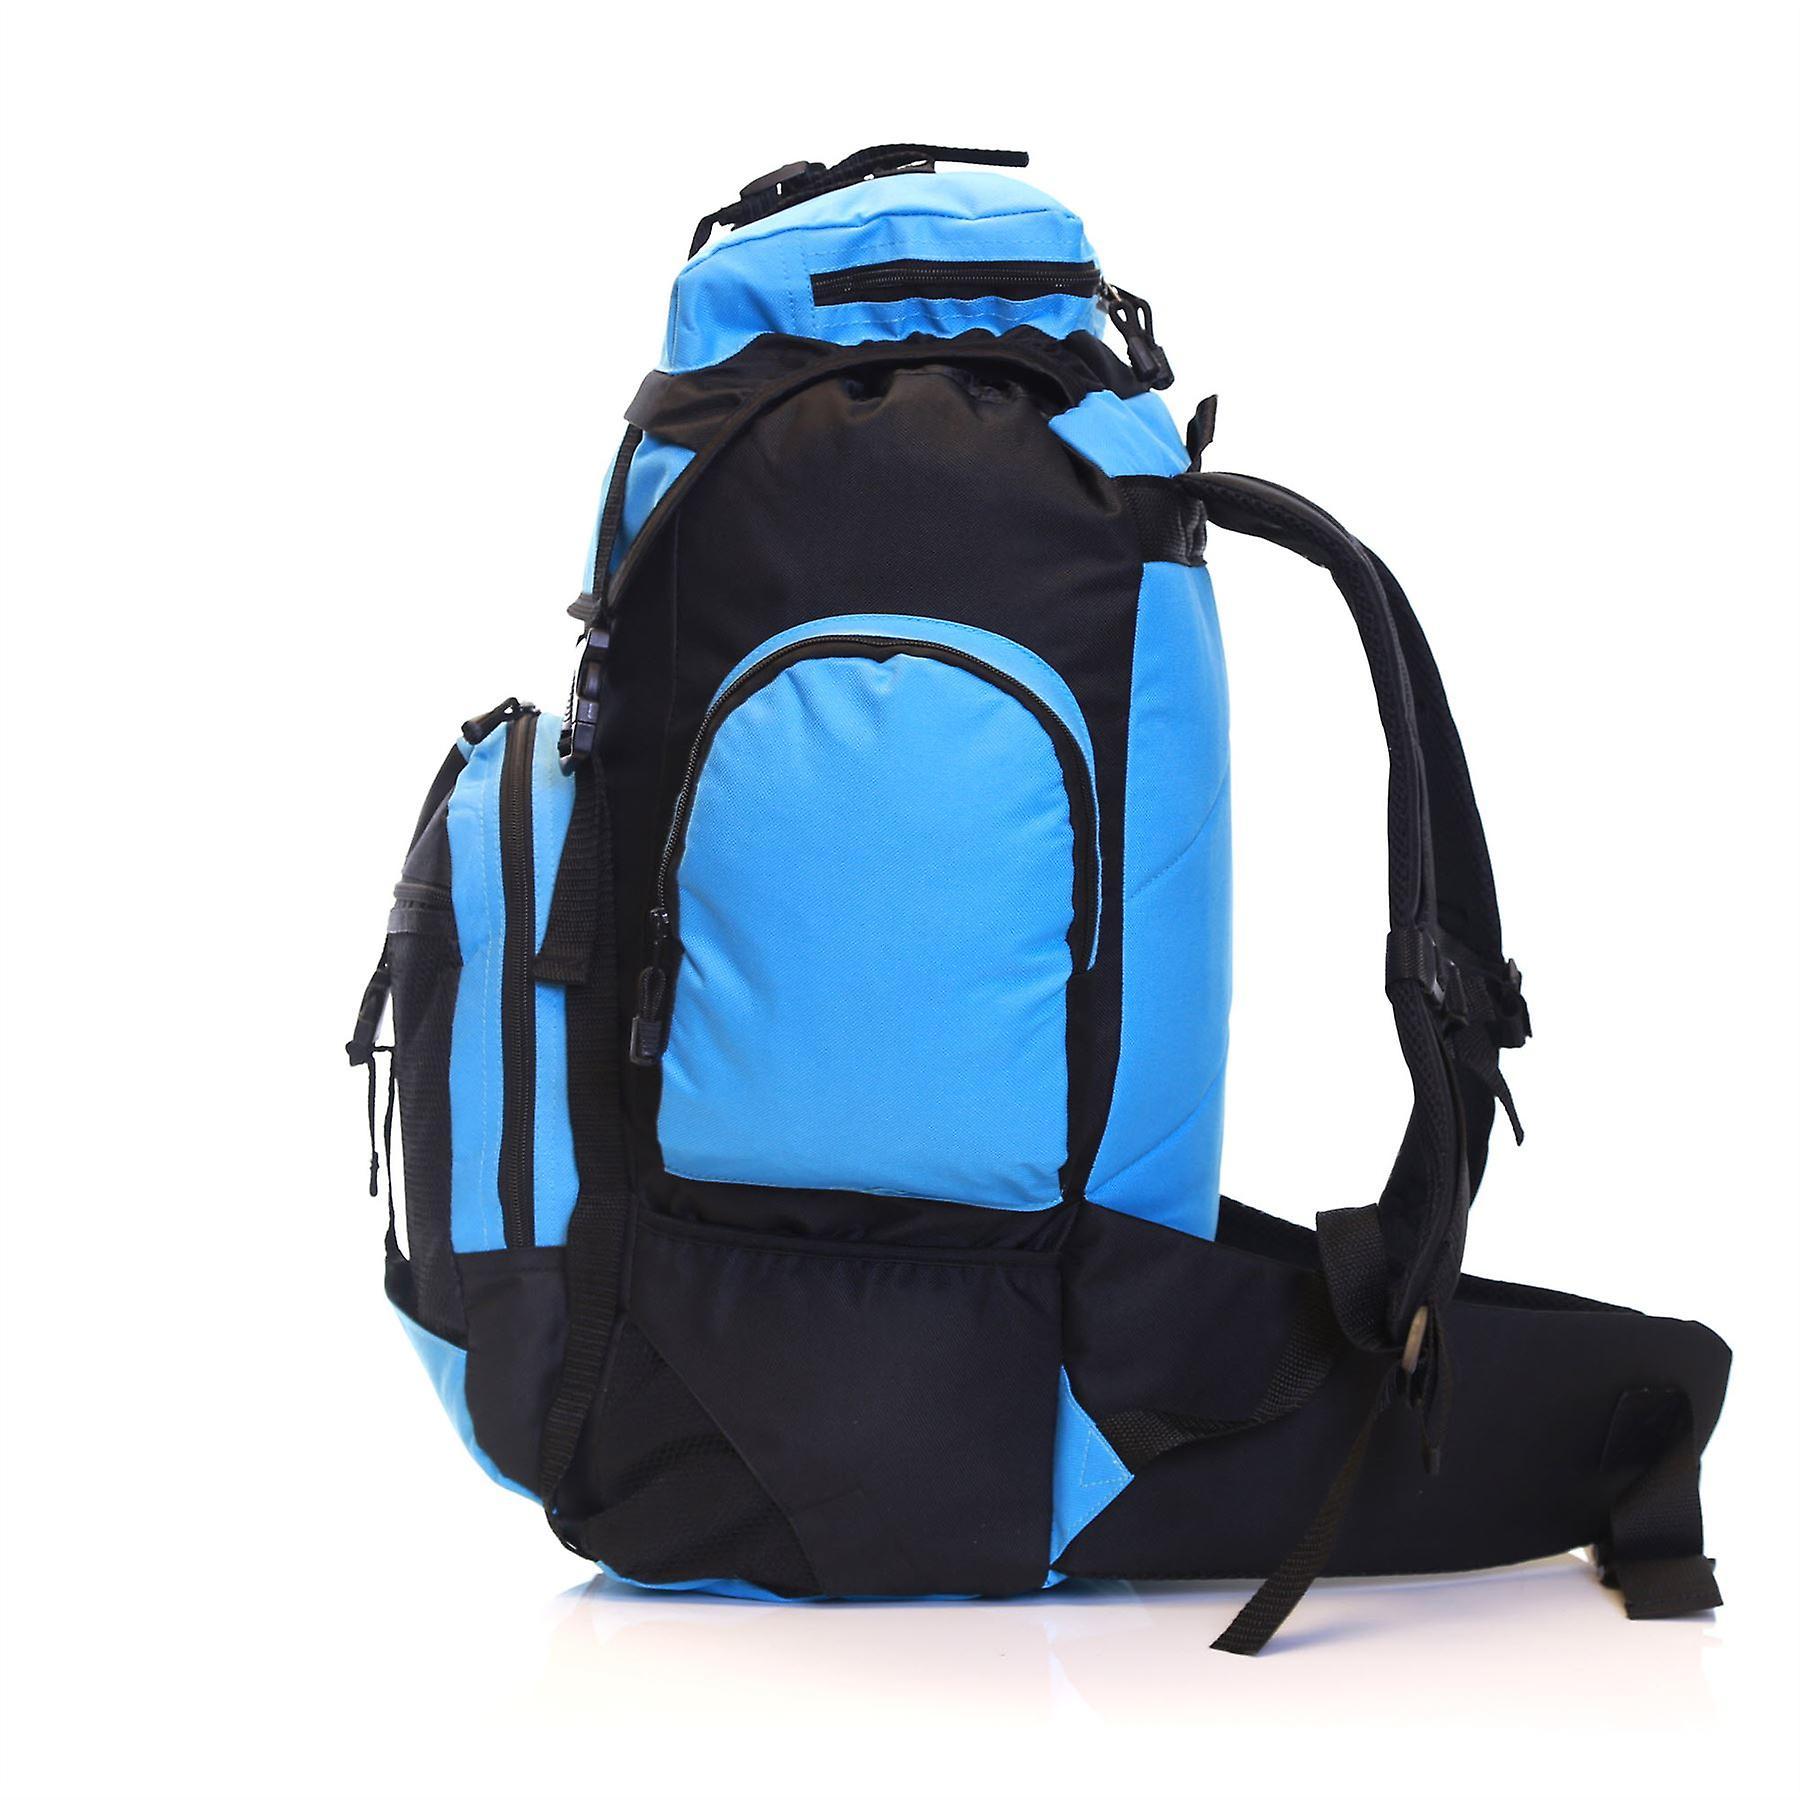 Slimbridge Knott 45 Litre Hiking Backpack, Black/Sky Blue